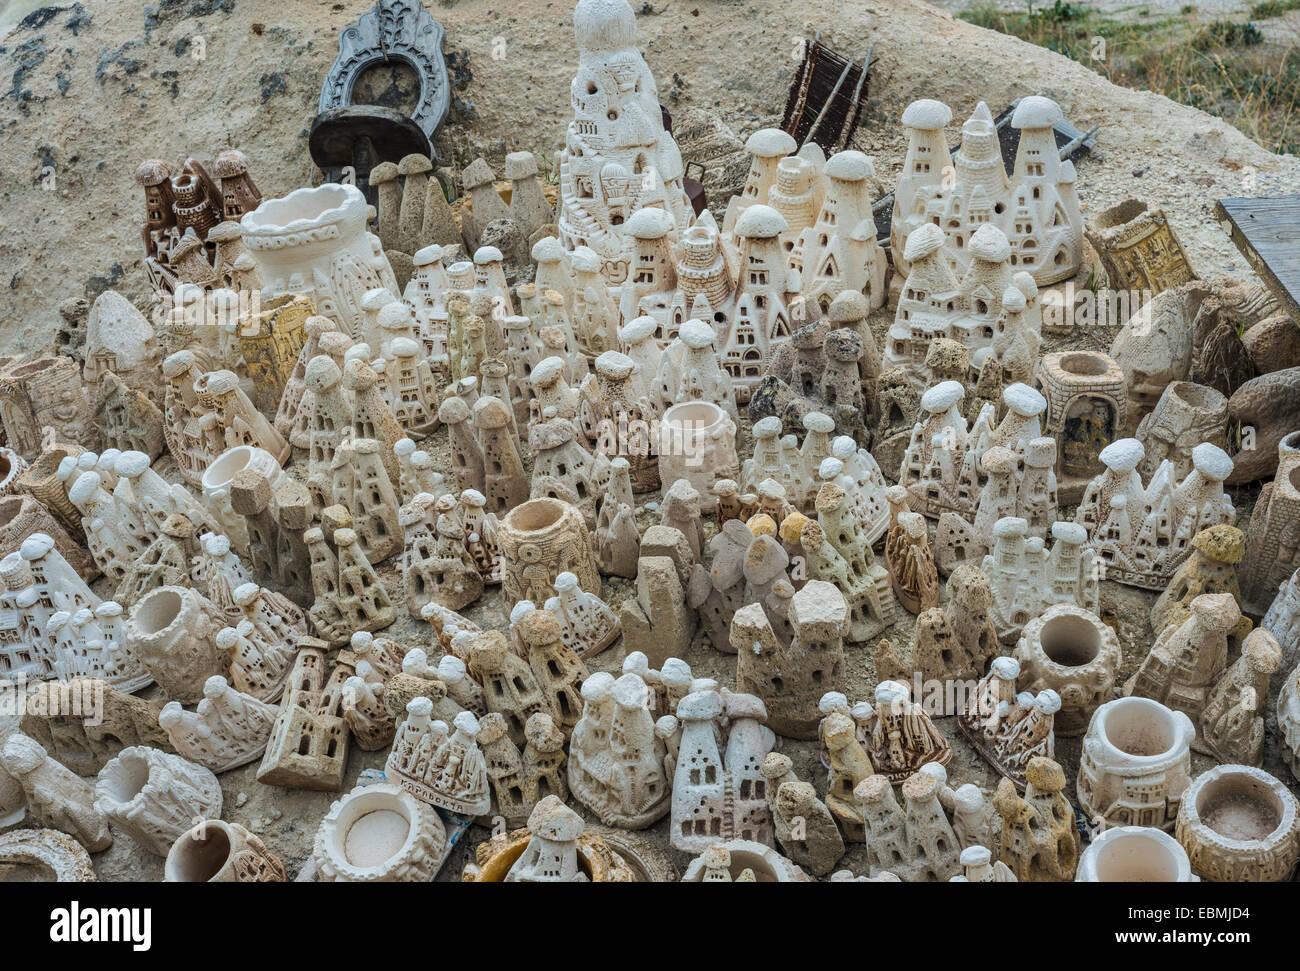 Souvenirs made of tufa, Göreme, Cappadocia, Nevsehir Province, Turkey - Stock Image